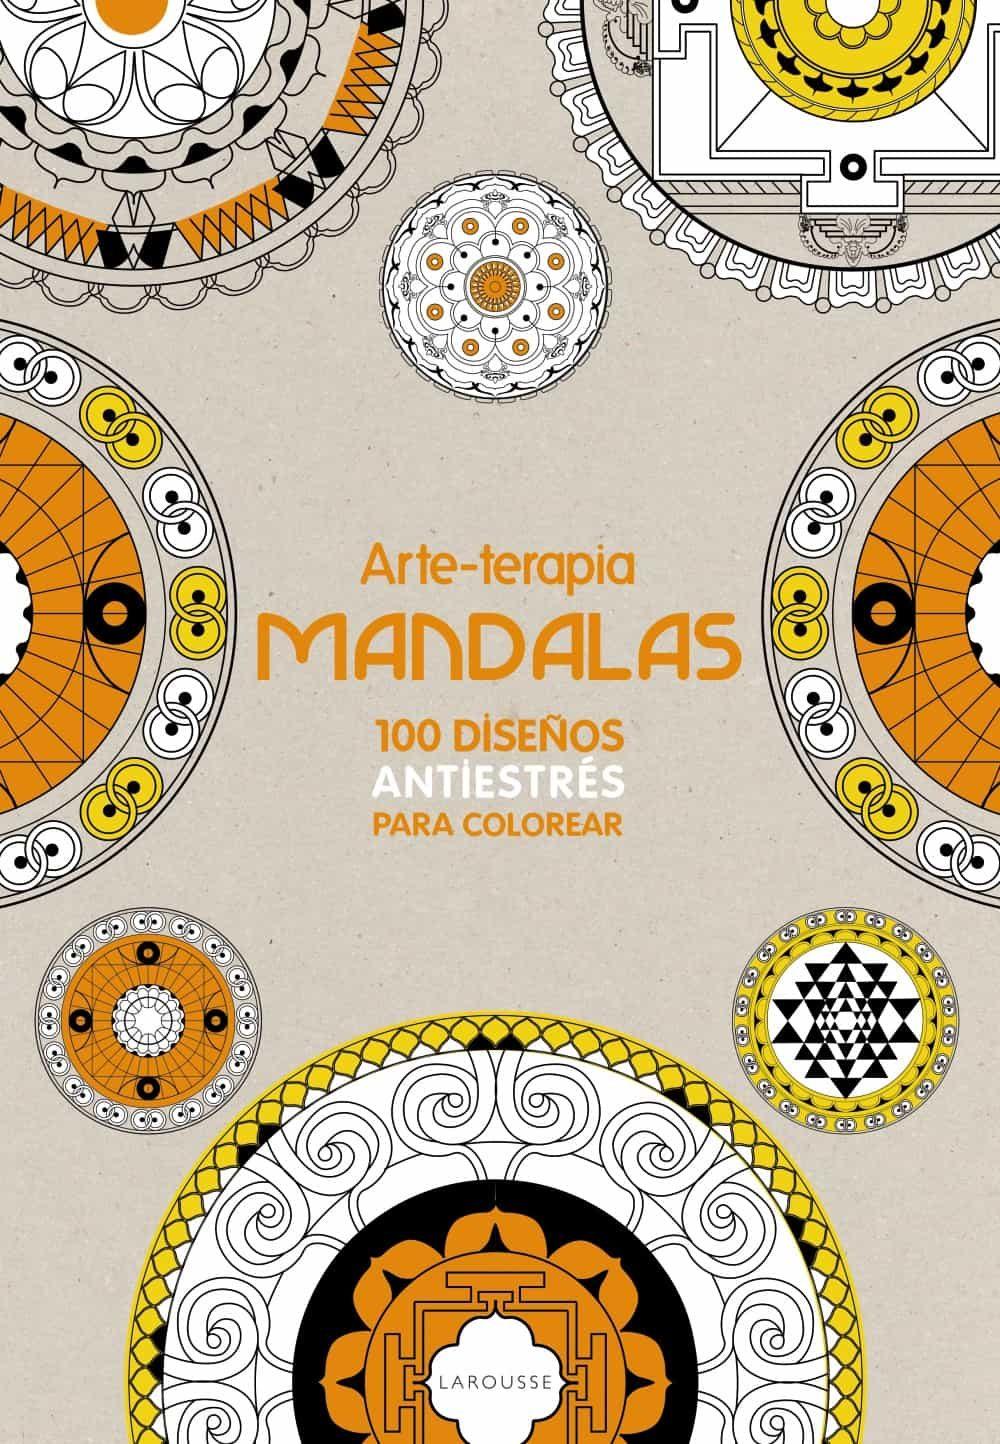 ARTE-TERAPIA MANDALAS. 100 DISEÑOS ANTIESTRES PARA COLOREAR | VV.AA ...